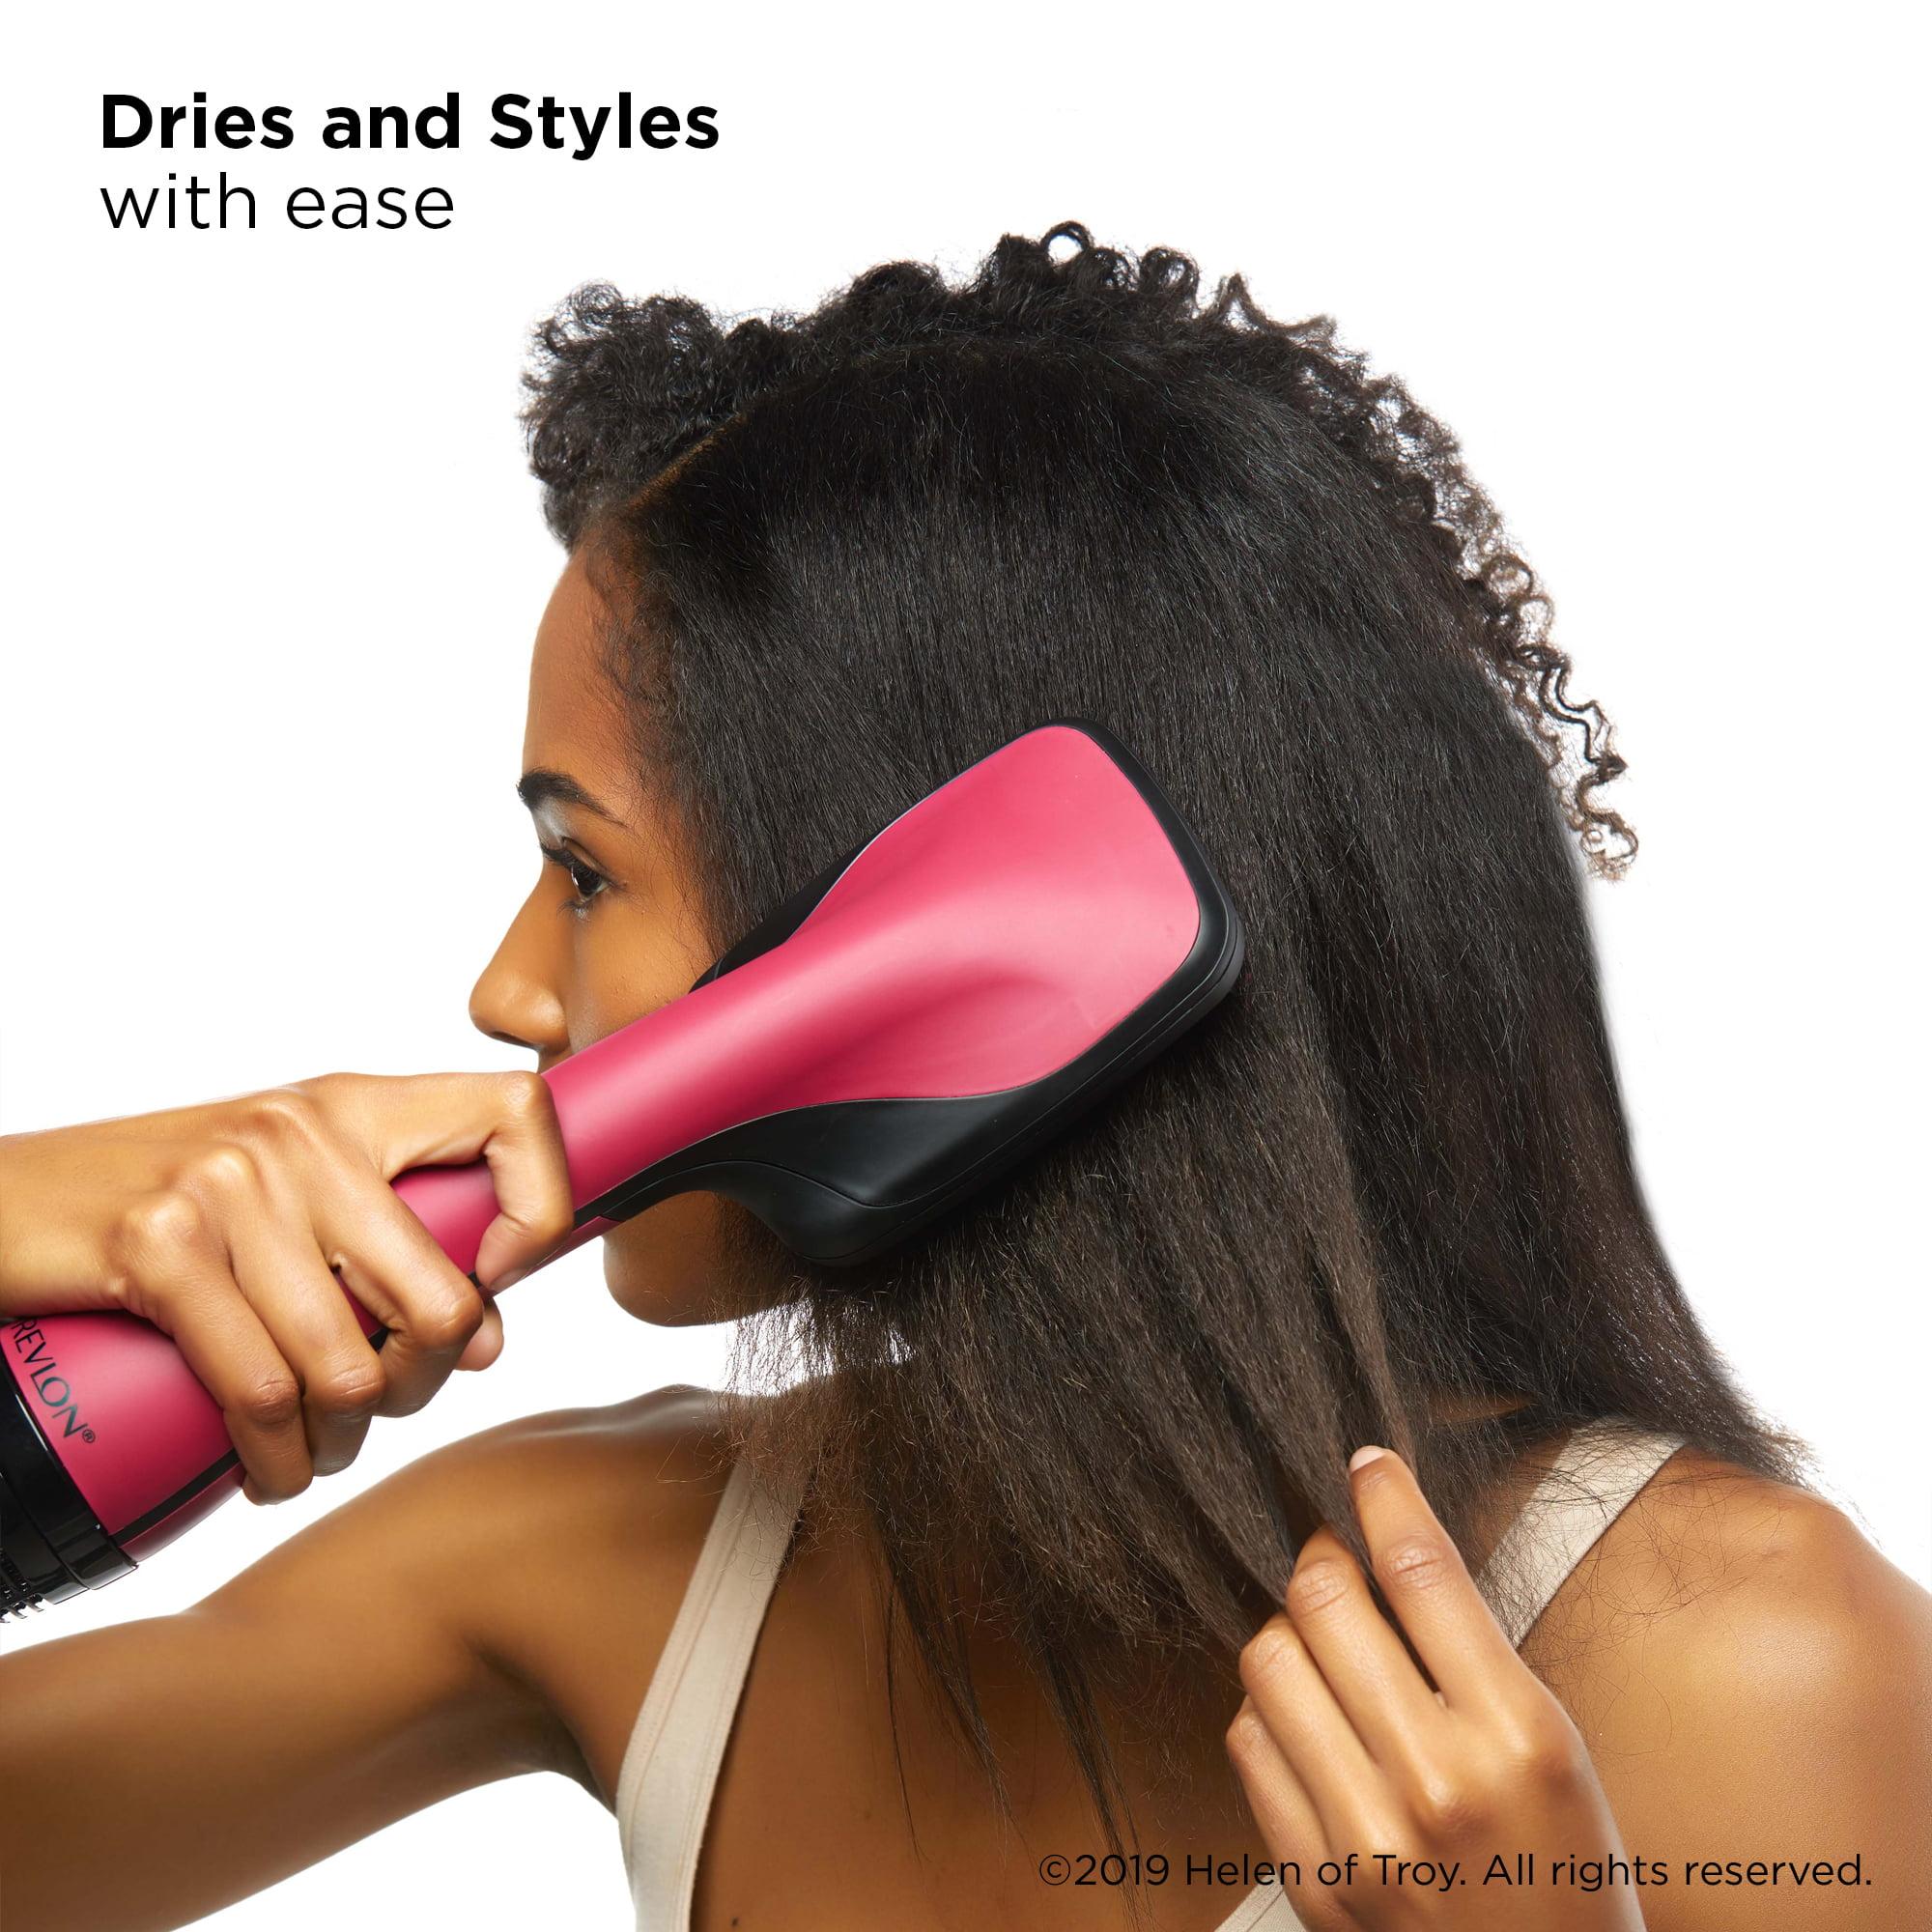 Revlon One-Step Hair Dryer and Styler, Black Blow Dryer - Walmart.com -  Walmart.com